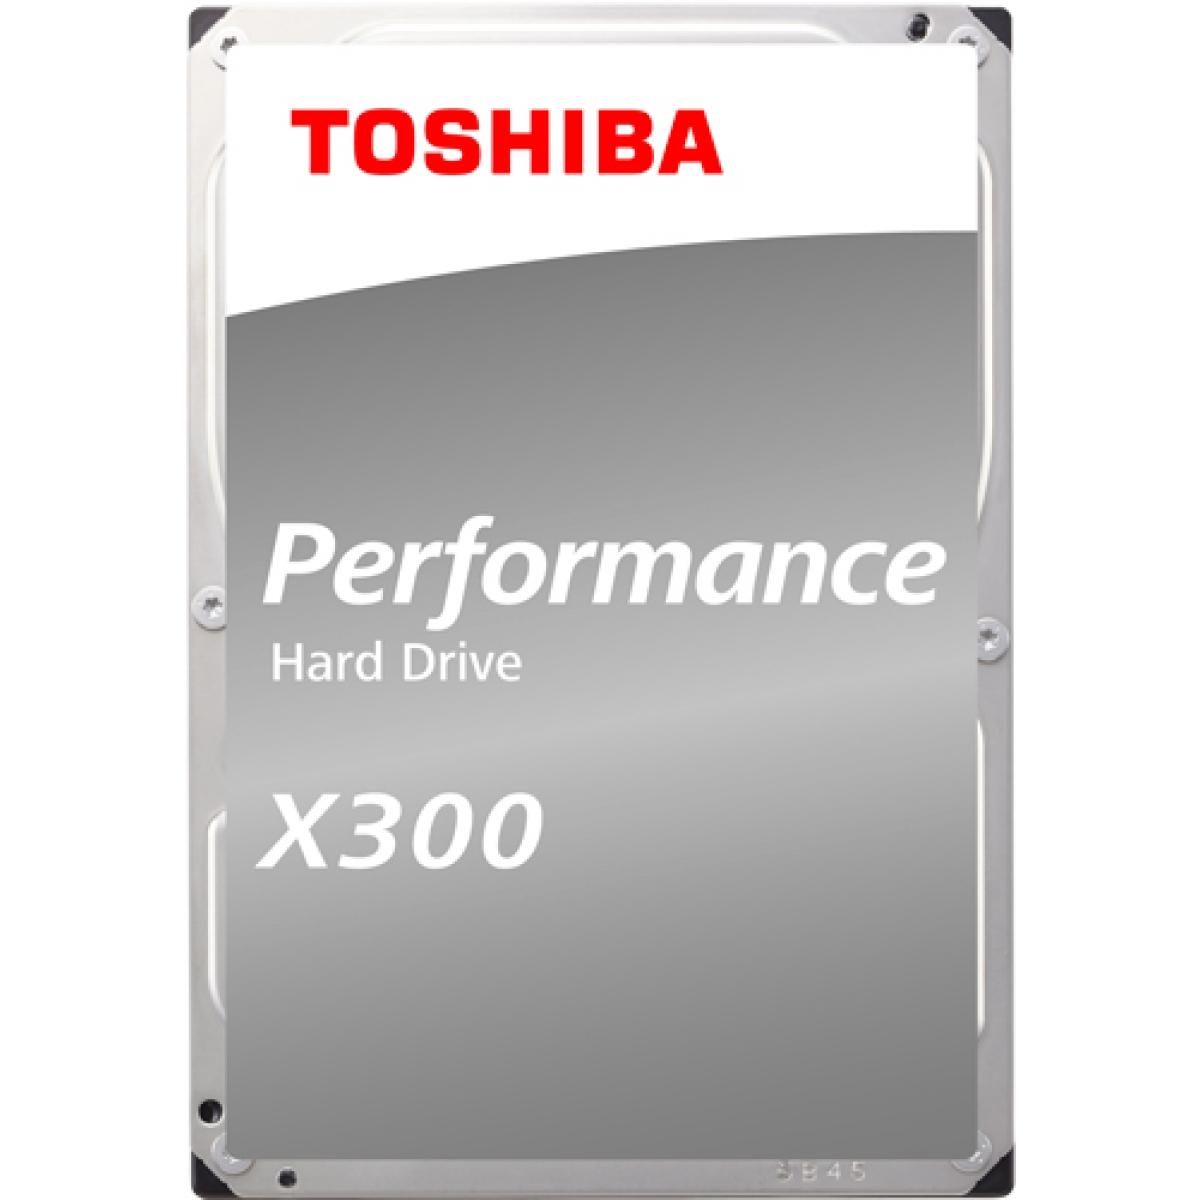 HD Toshiba 4TB X300 Performance e Gaming HDWE140XZSTA 7200 RPM 128MB Sata III Box